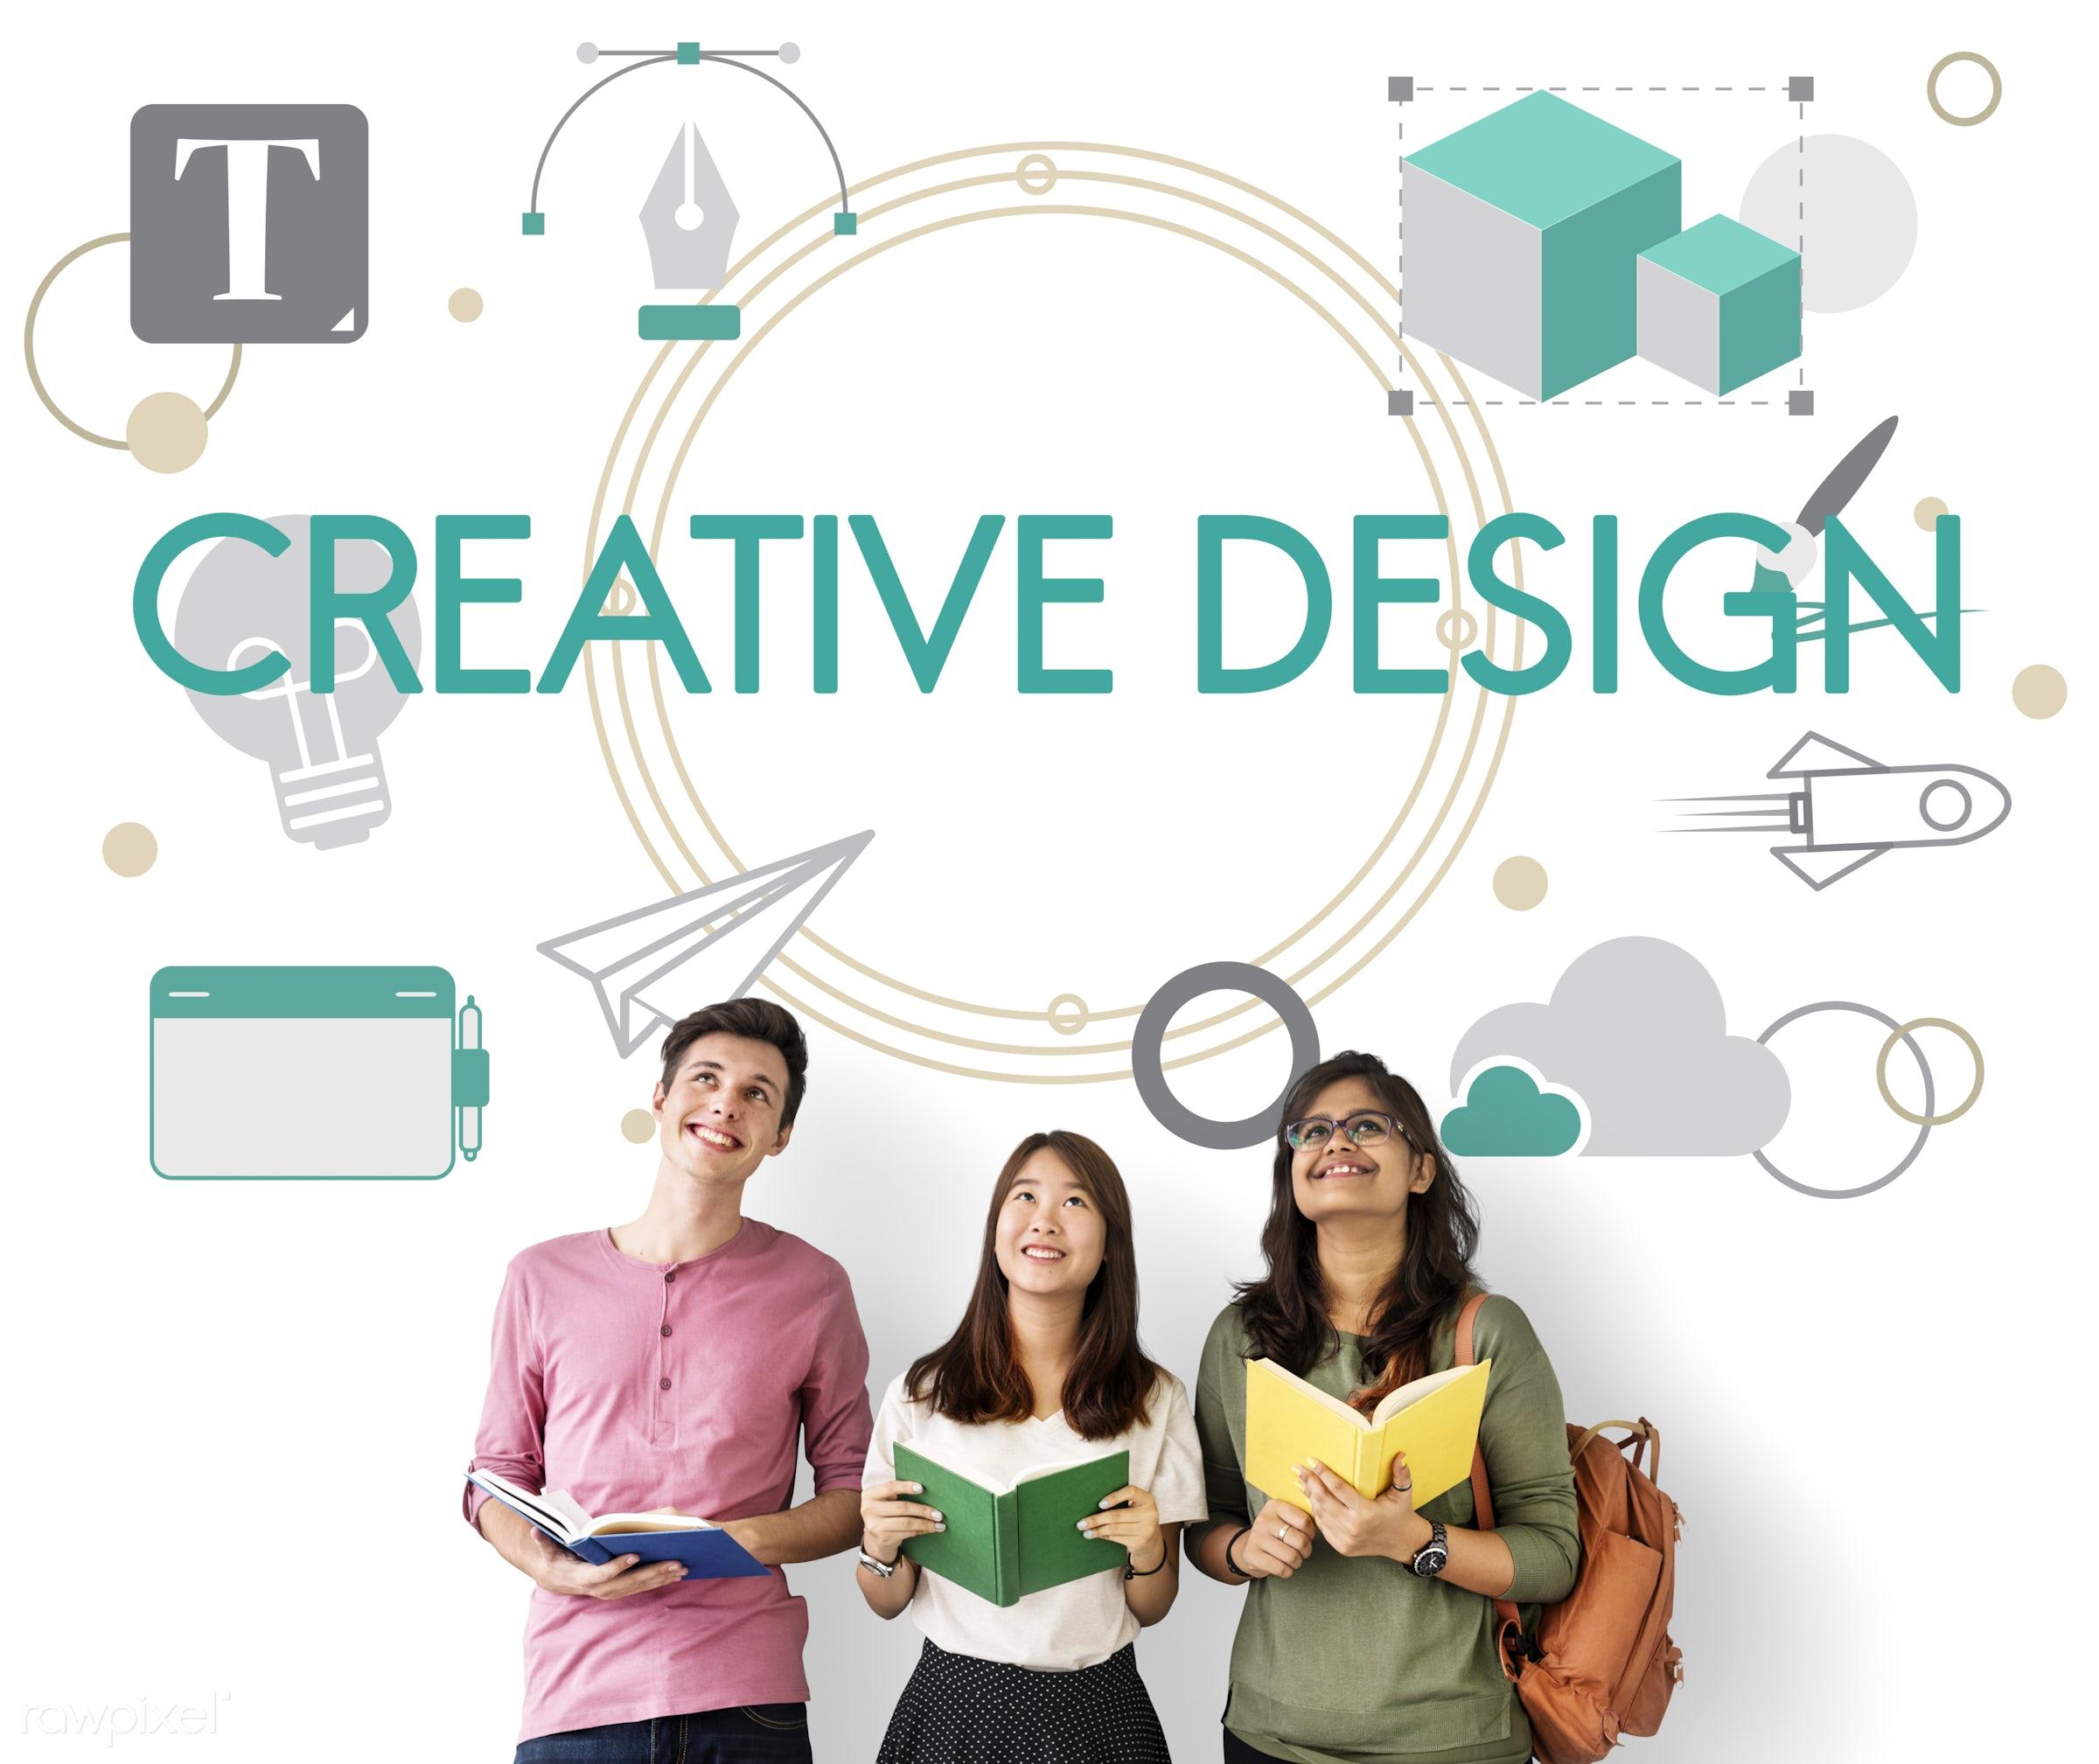 action, african descent, architecture, asian, be creative, book, brainstorm, business, caucasian, challenge, configuration,...